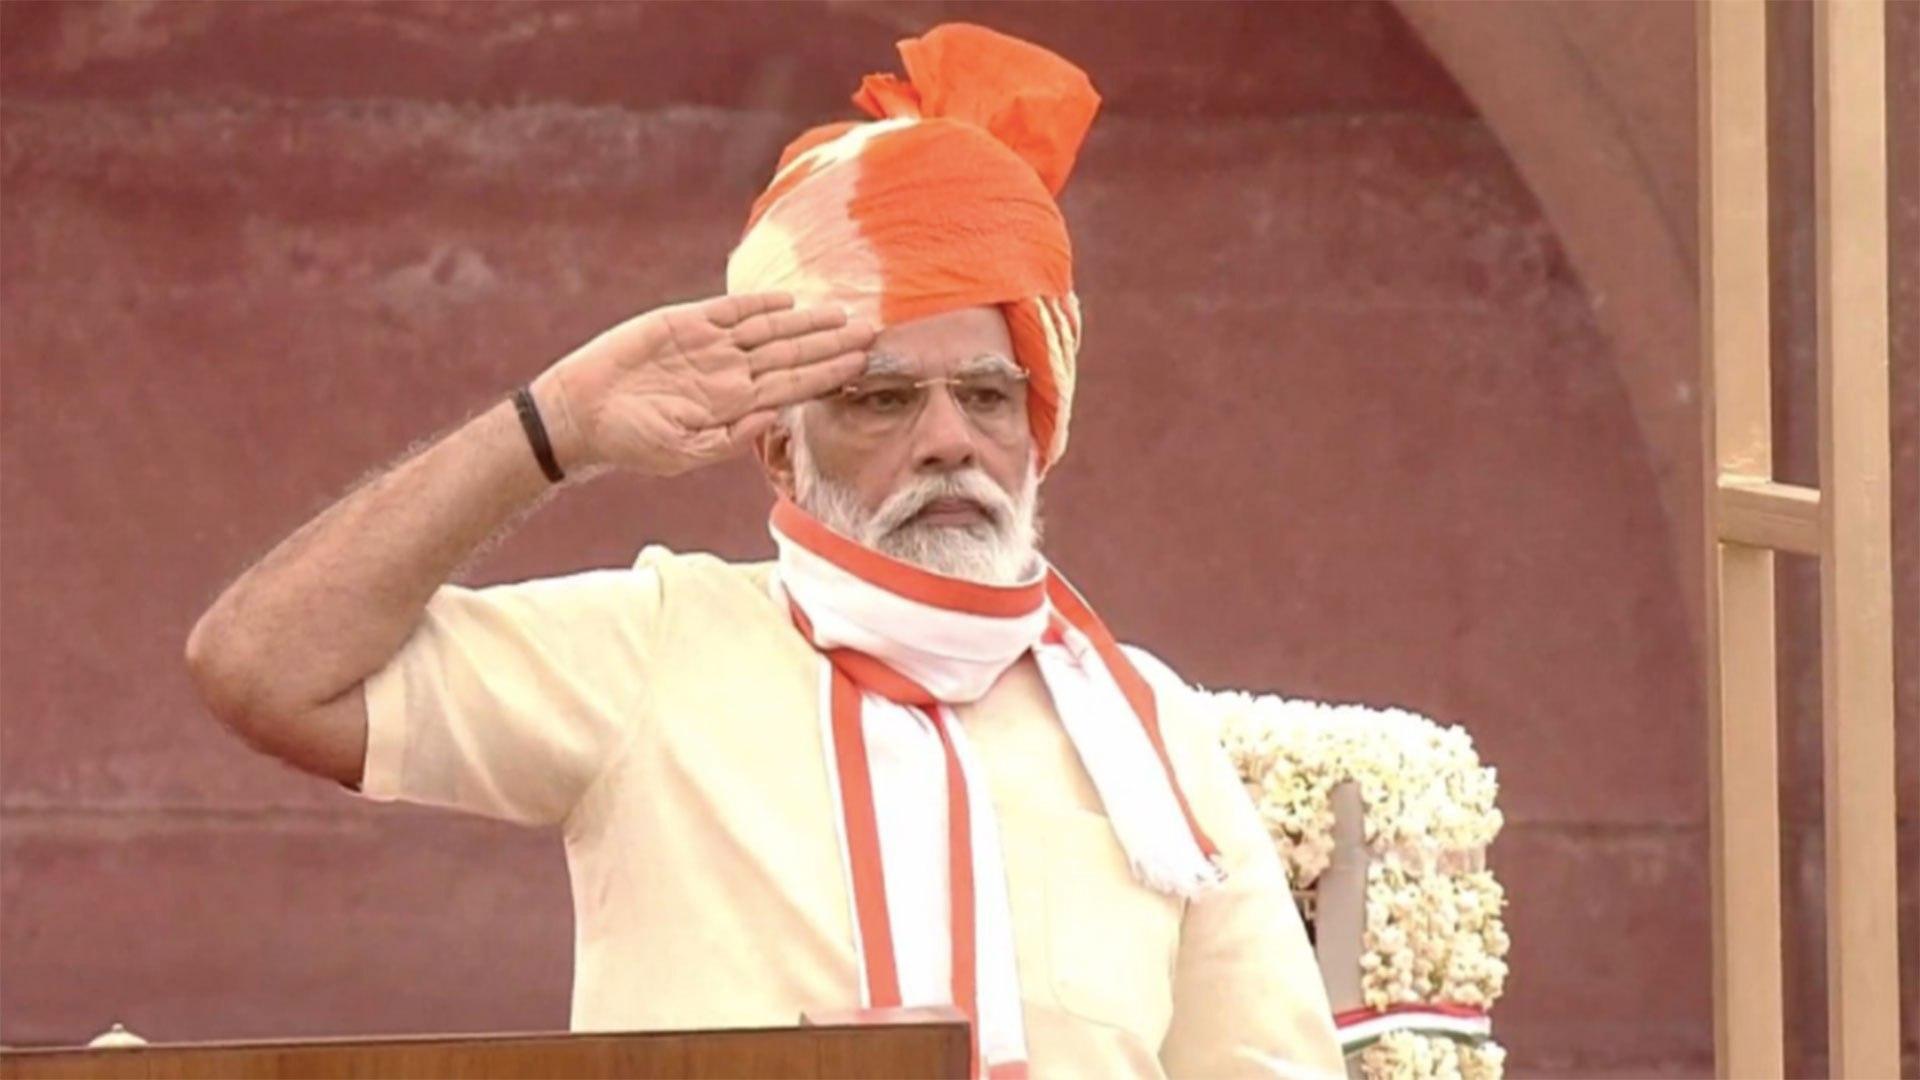 PM Modi pays tribute to corona warriors of India